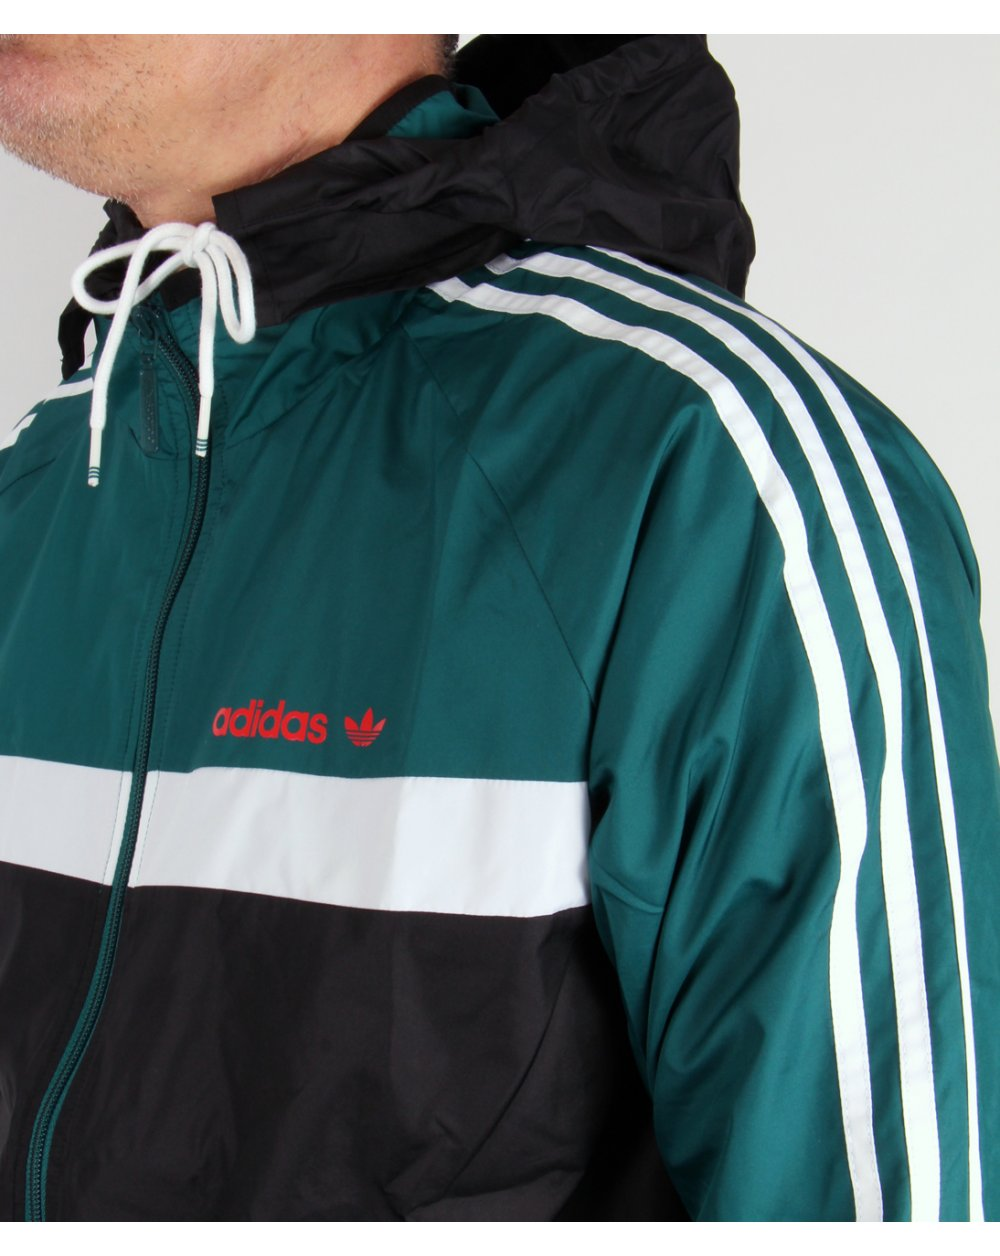 b80d0ed4530fc adidas originals marathon 83 jacket black,